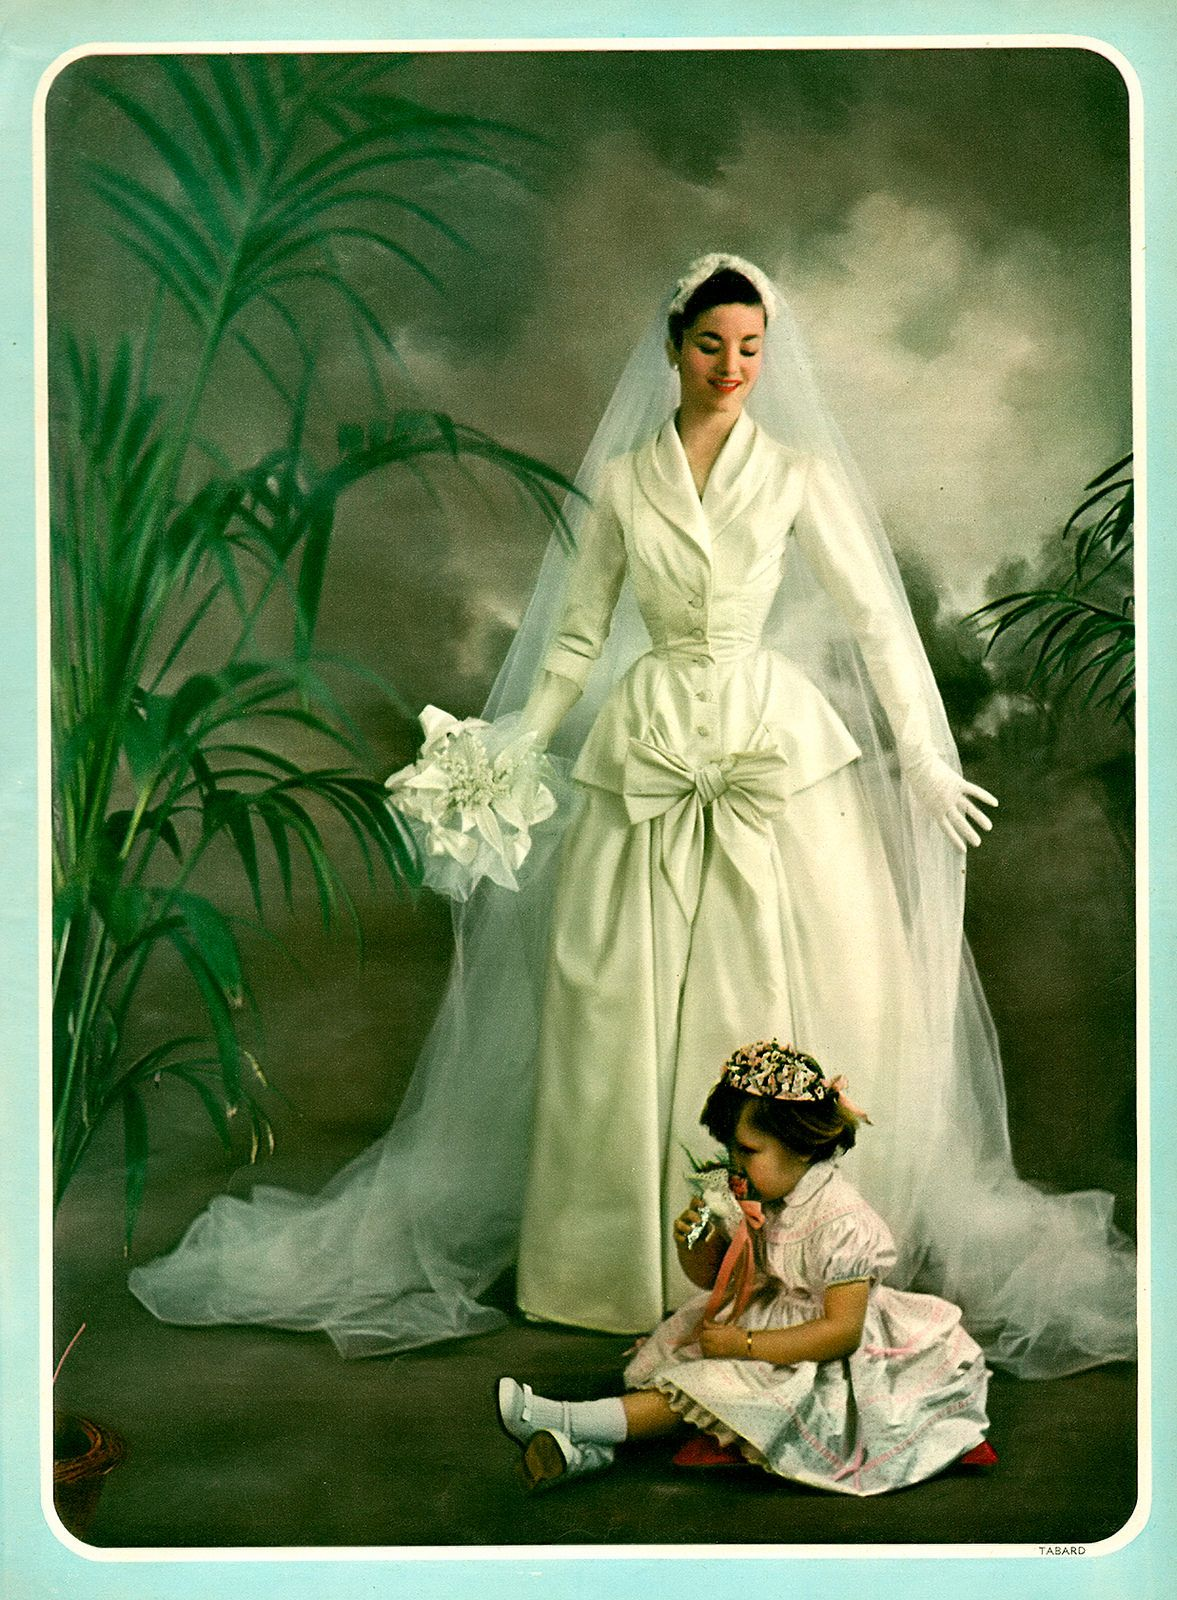 1950 wedding dress  Wedding Day   Weddings  Pinterest  Vintage weddings Weddings